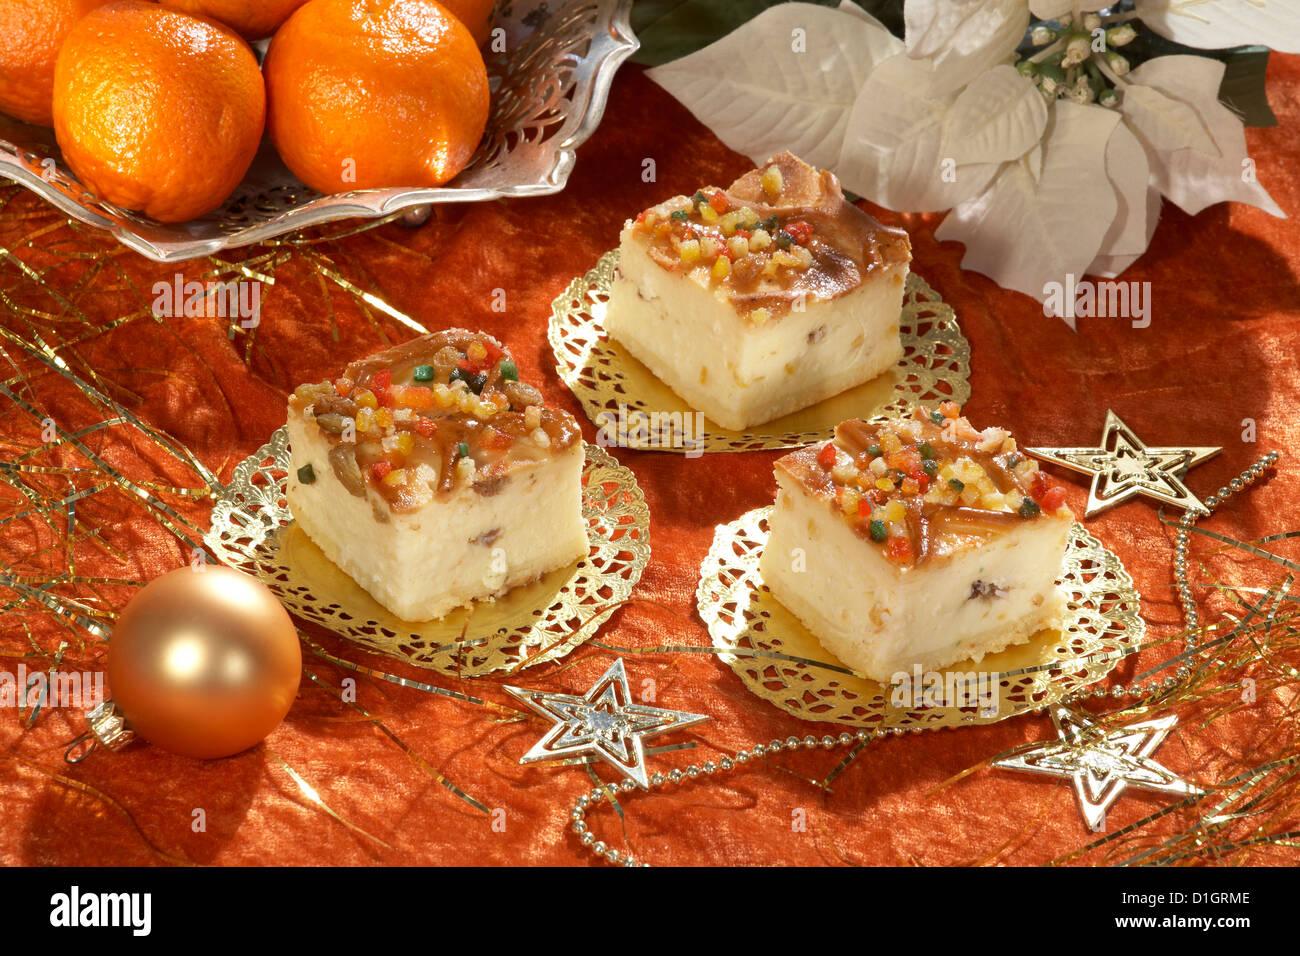 Christmas Cheesecake with raisins - Stock Image